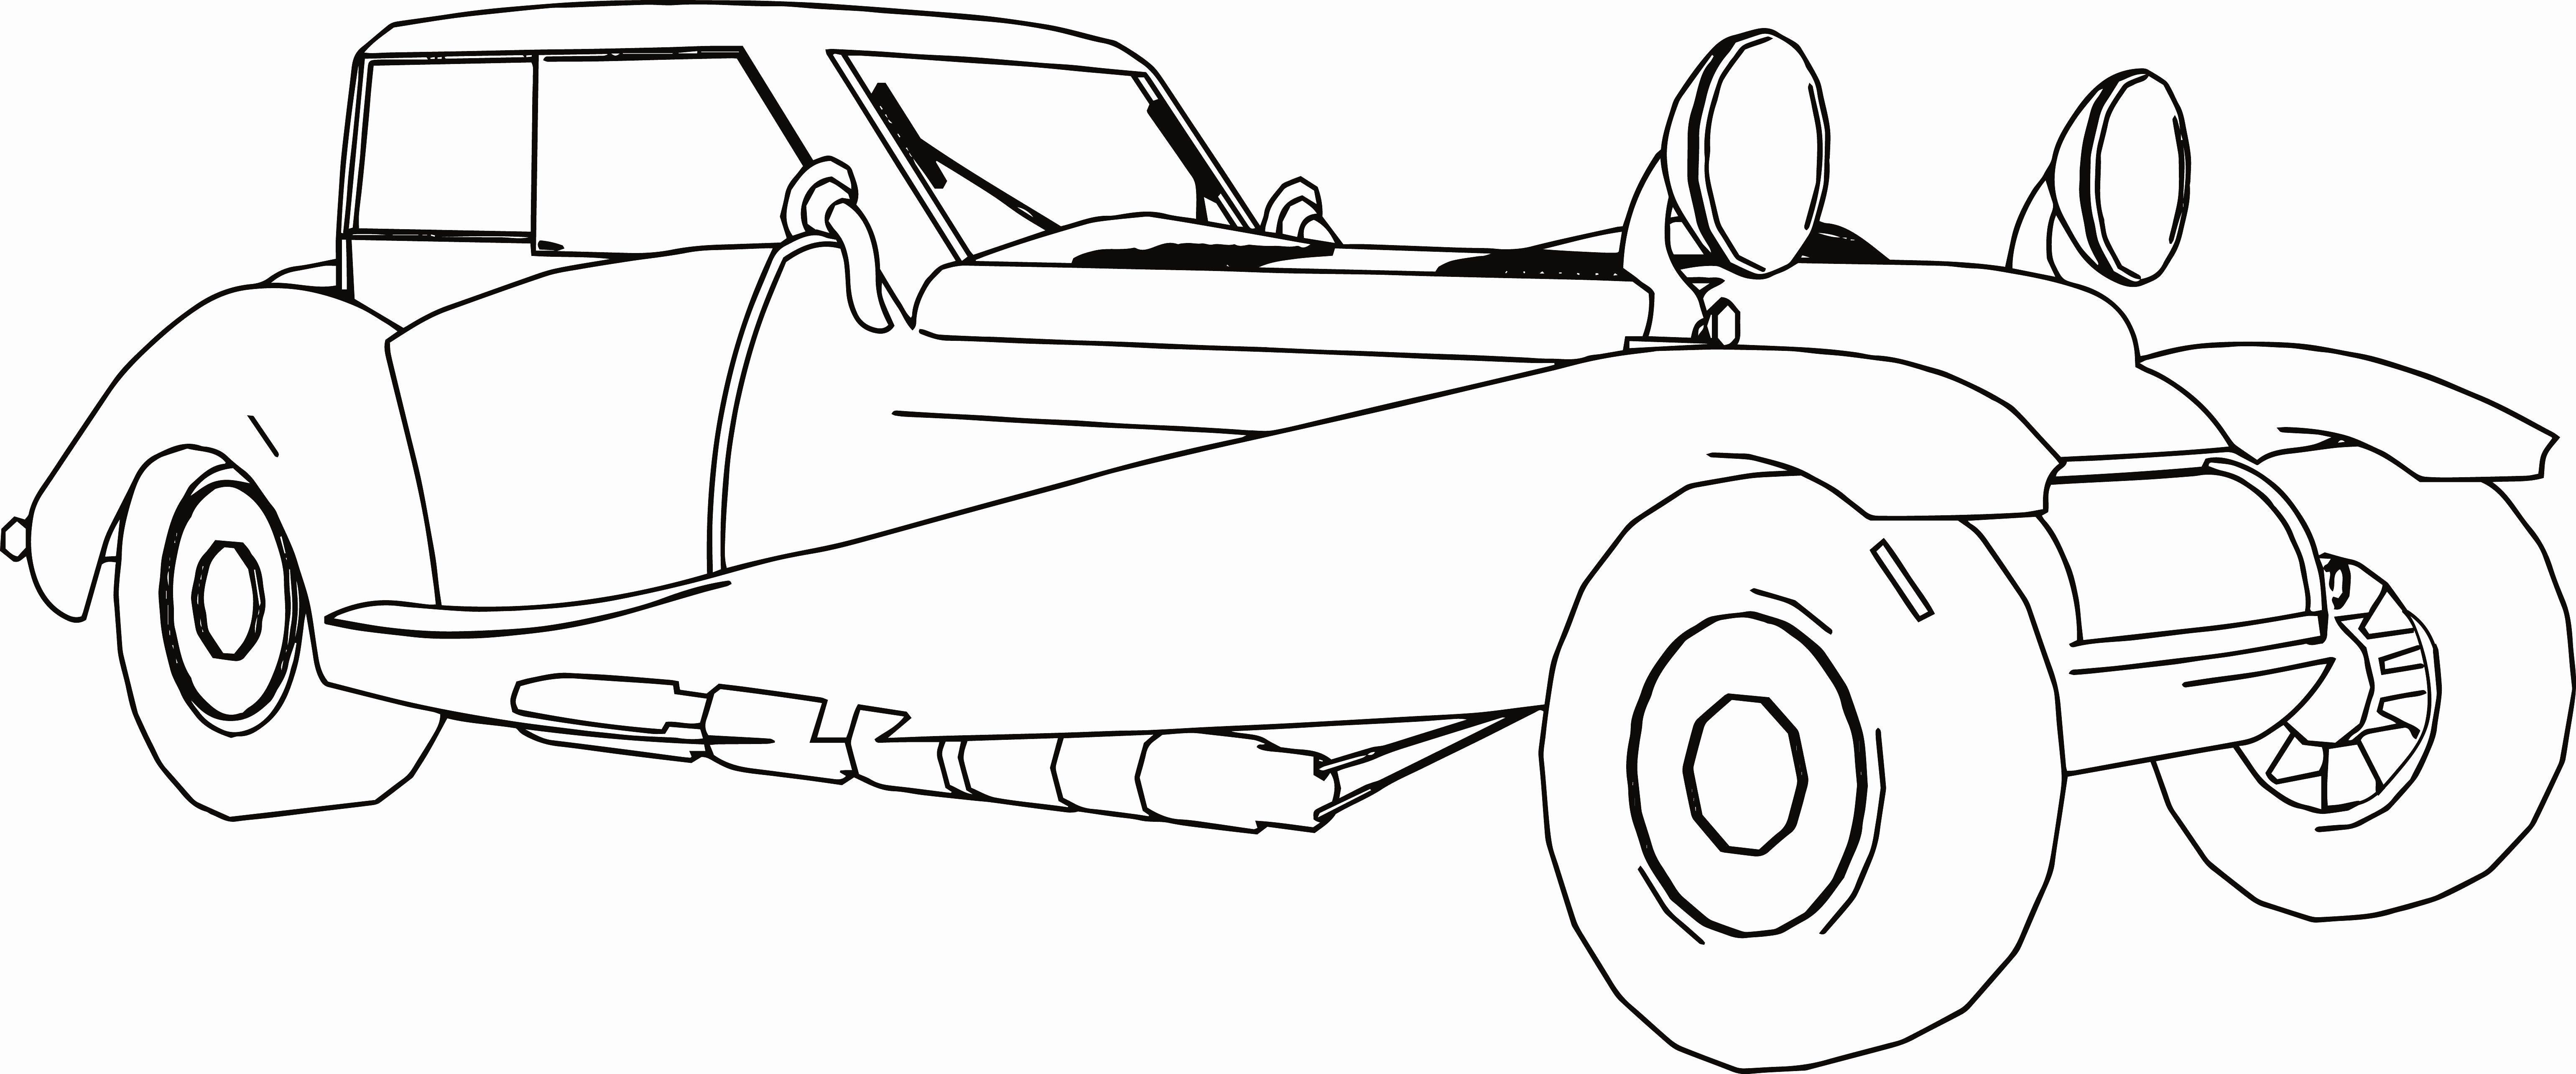 Design Originals Coloring New Best Cars Racing Coloring Pages Nocn Cars Coloring Pages Race Car Coloring Pages Truck Coloring Pages